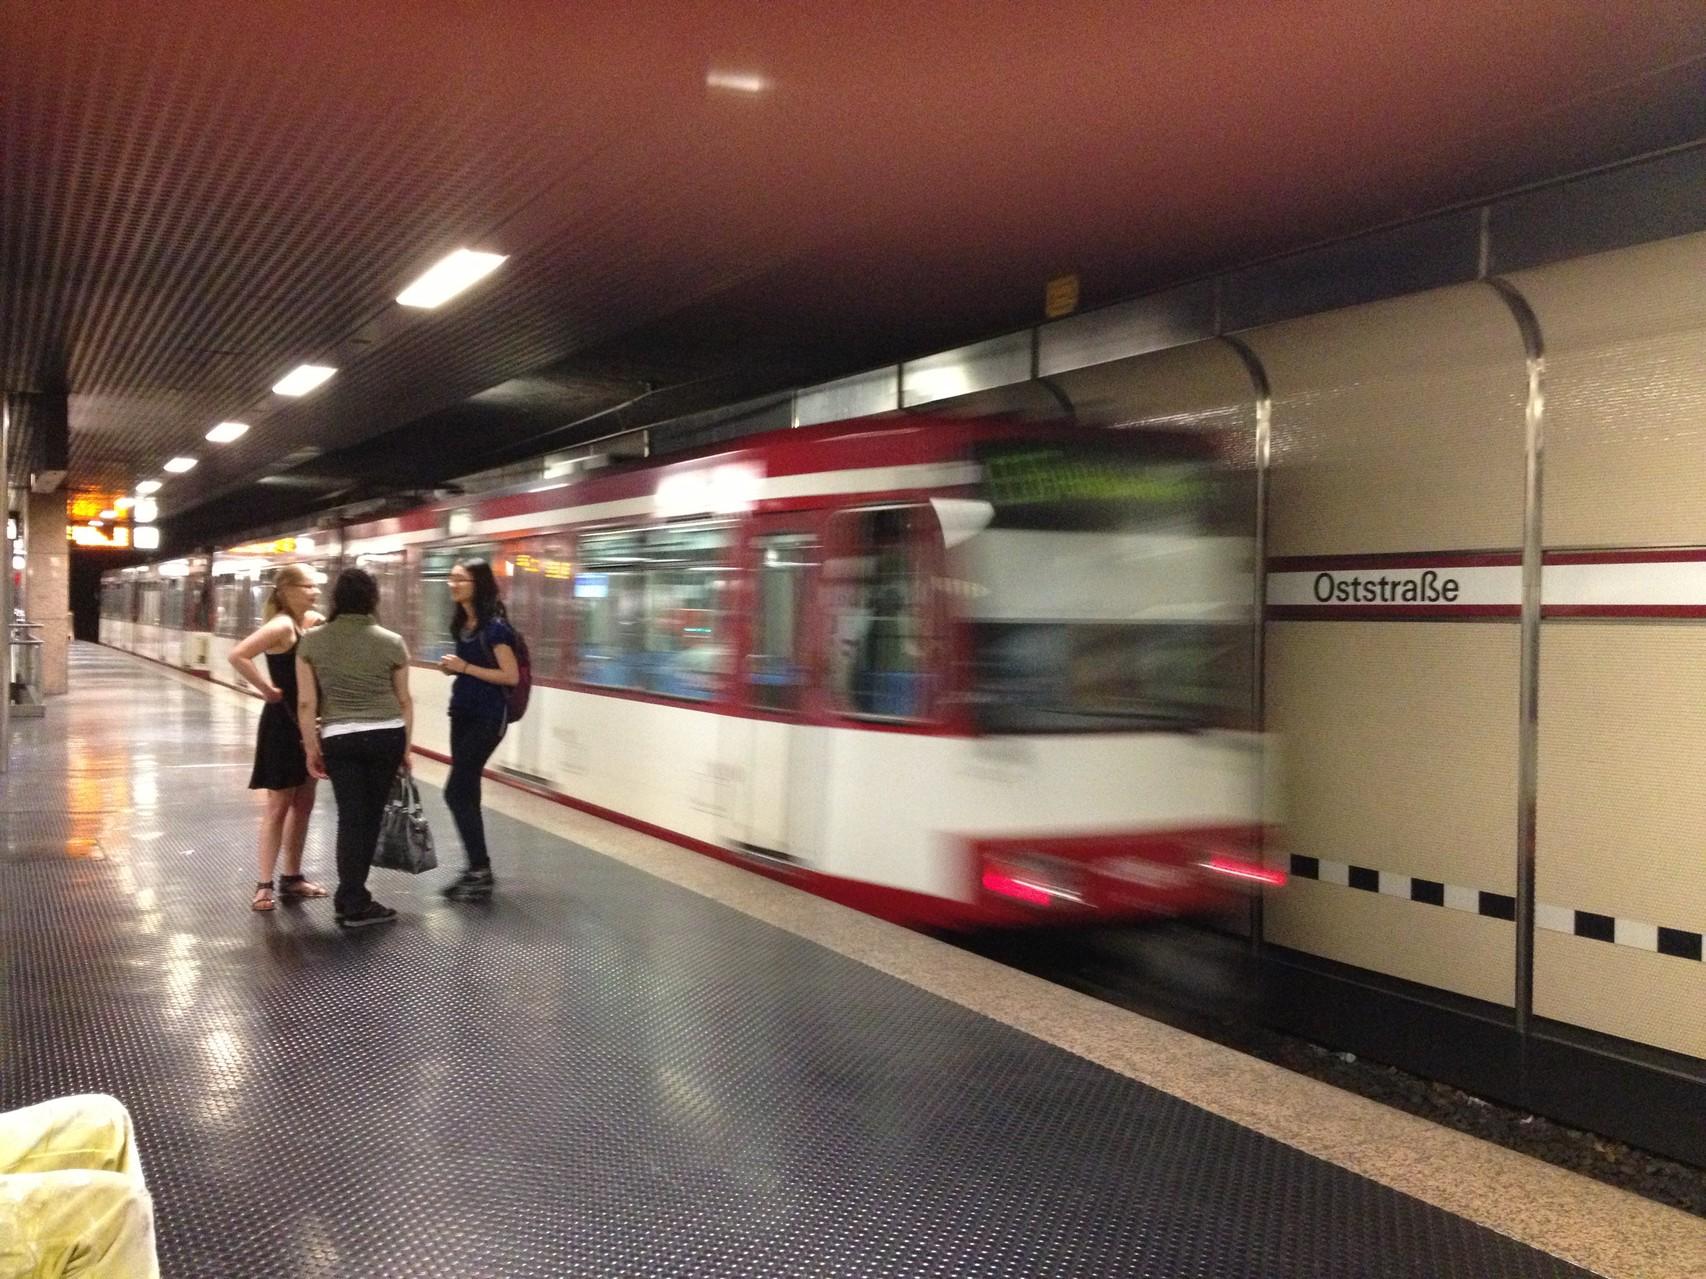 Uバーン 「オスト駅」 地下鉄から路面電車へと繋がります